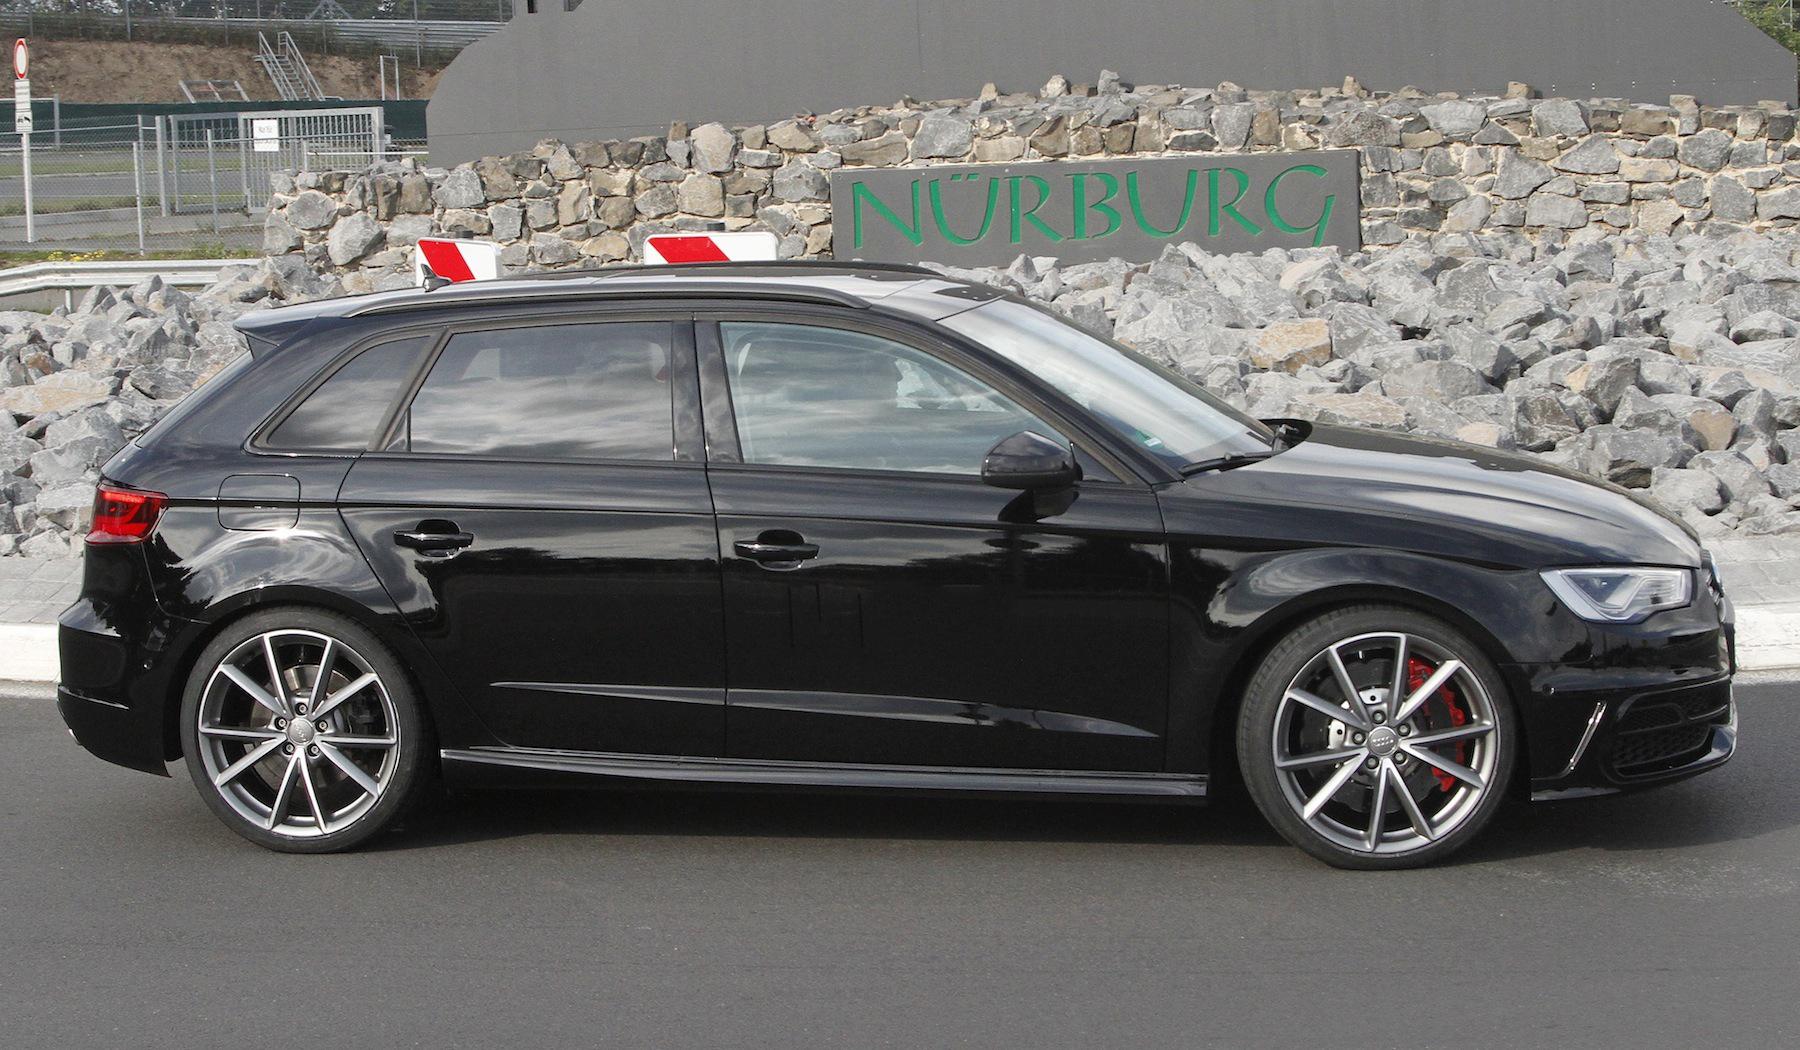 Audi Rs3 2015 Nuovi Dettagli Da Fonti Interne Ad Audi